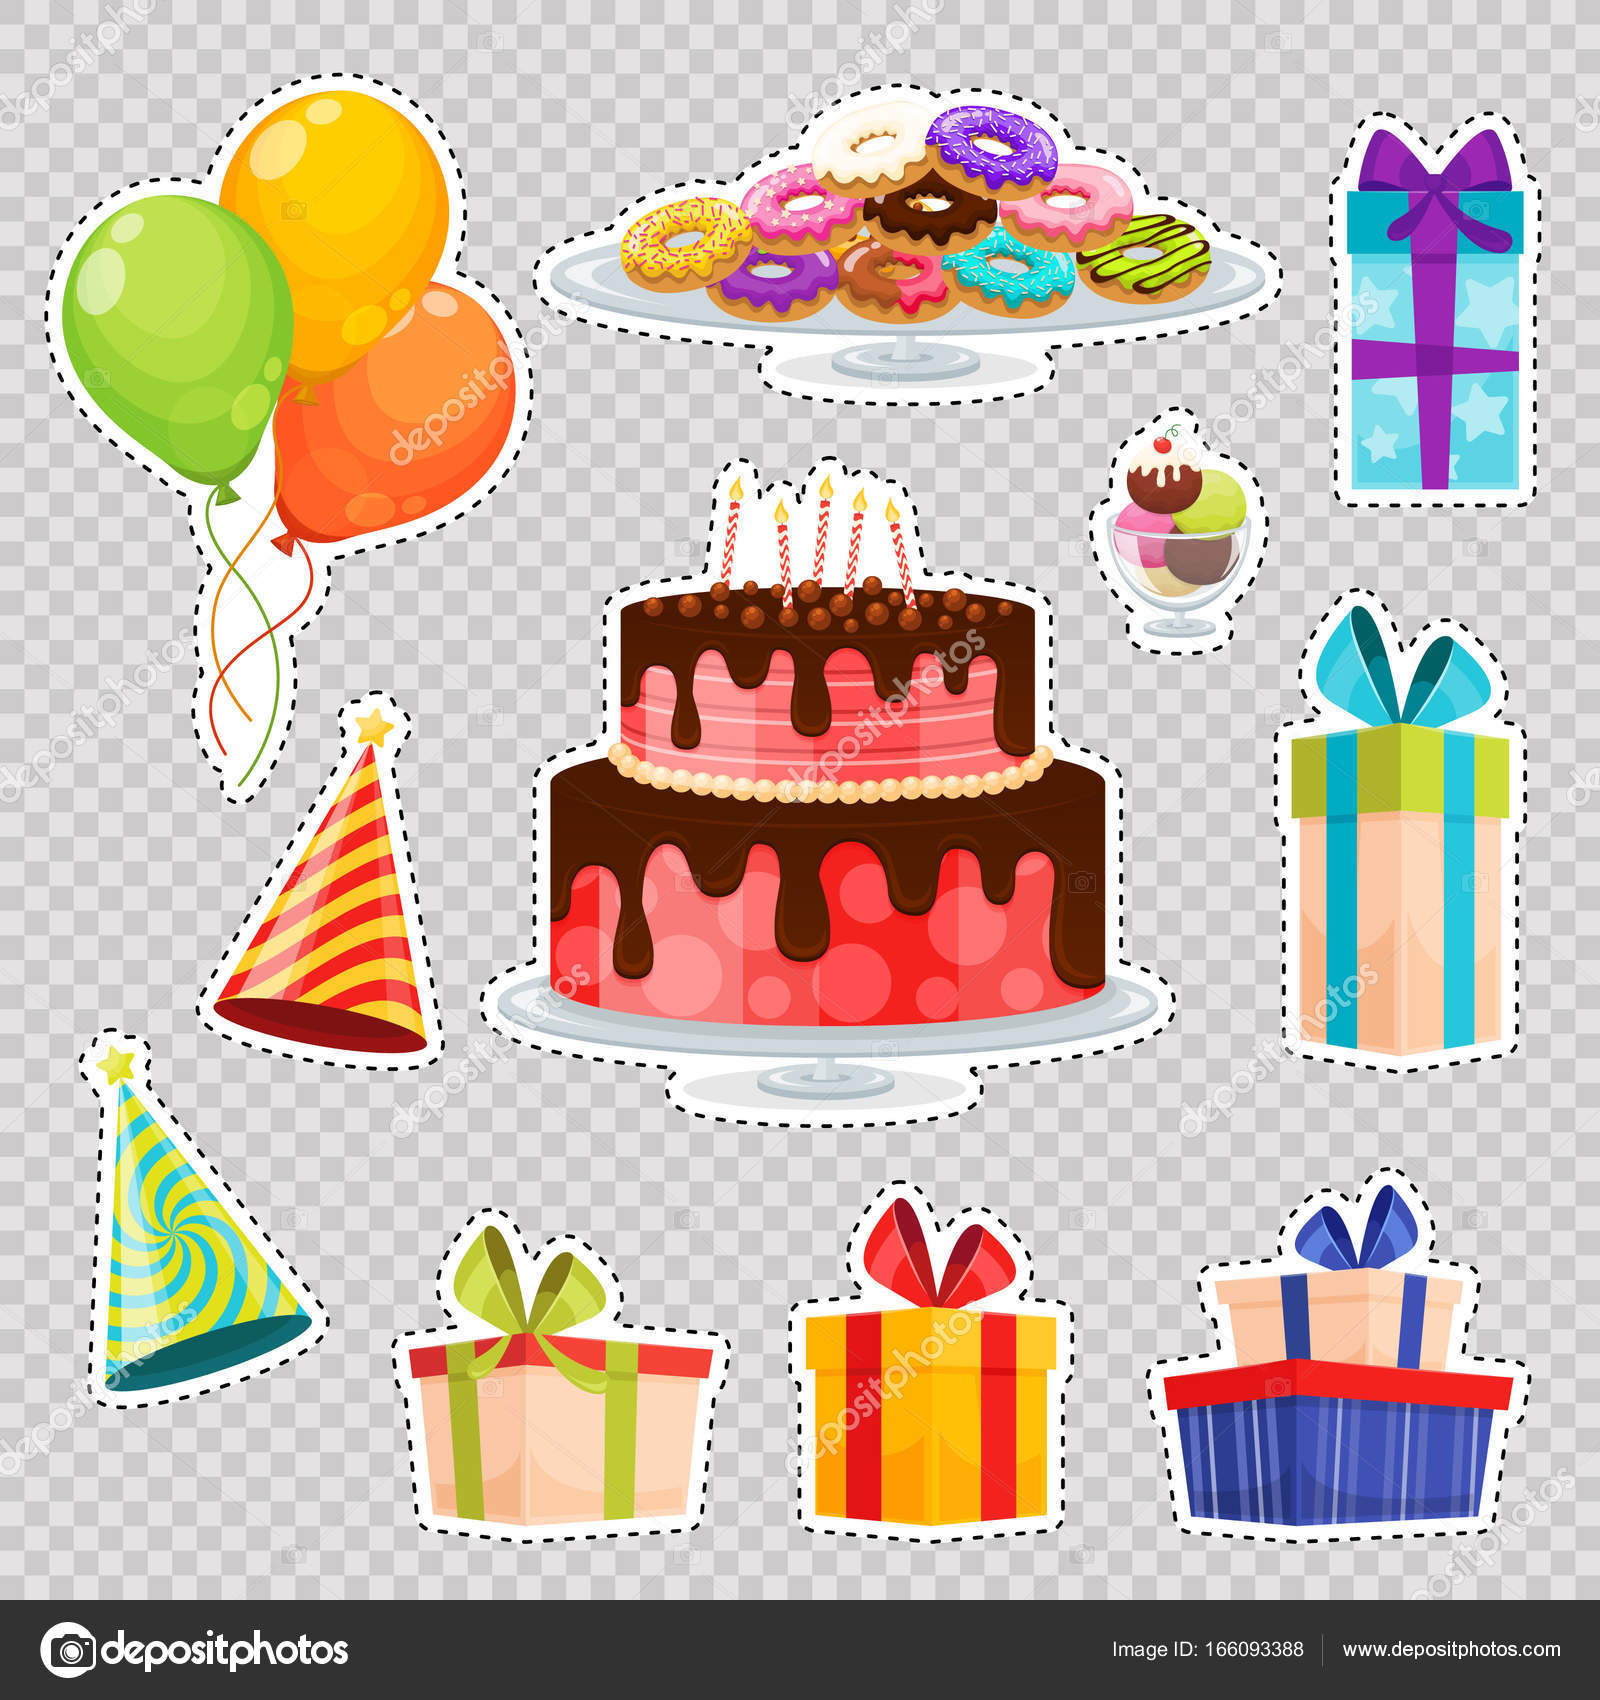 Patch Badges Birthday Cake Balloons Gift Box Hats Ice Cream Stock